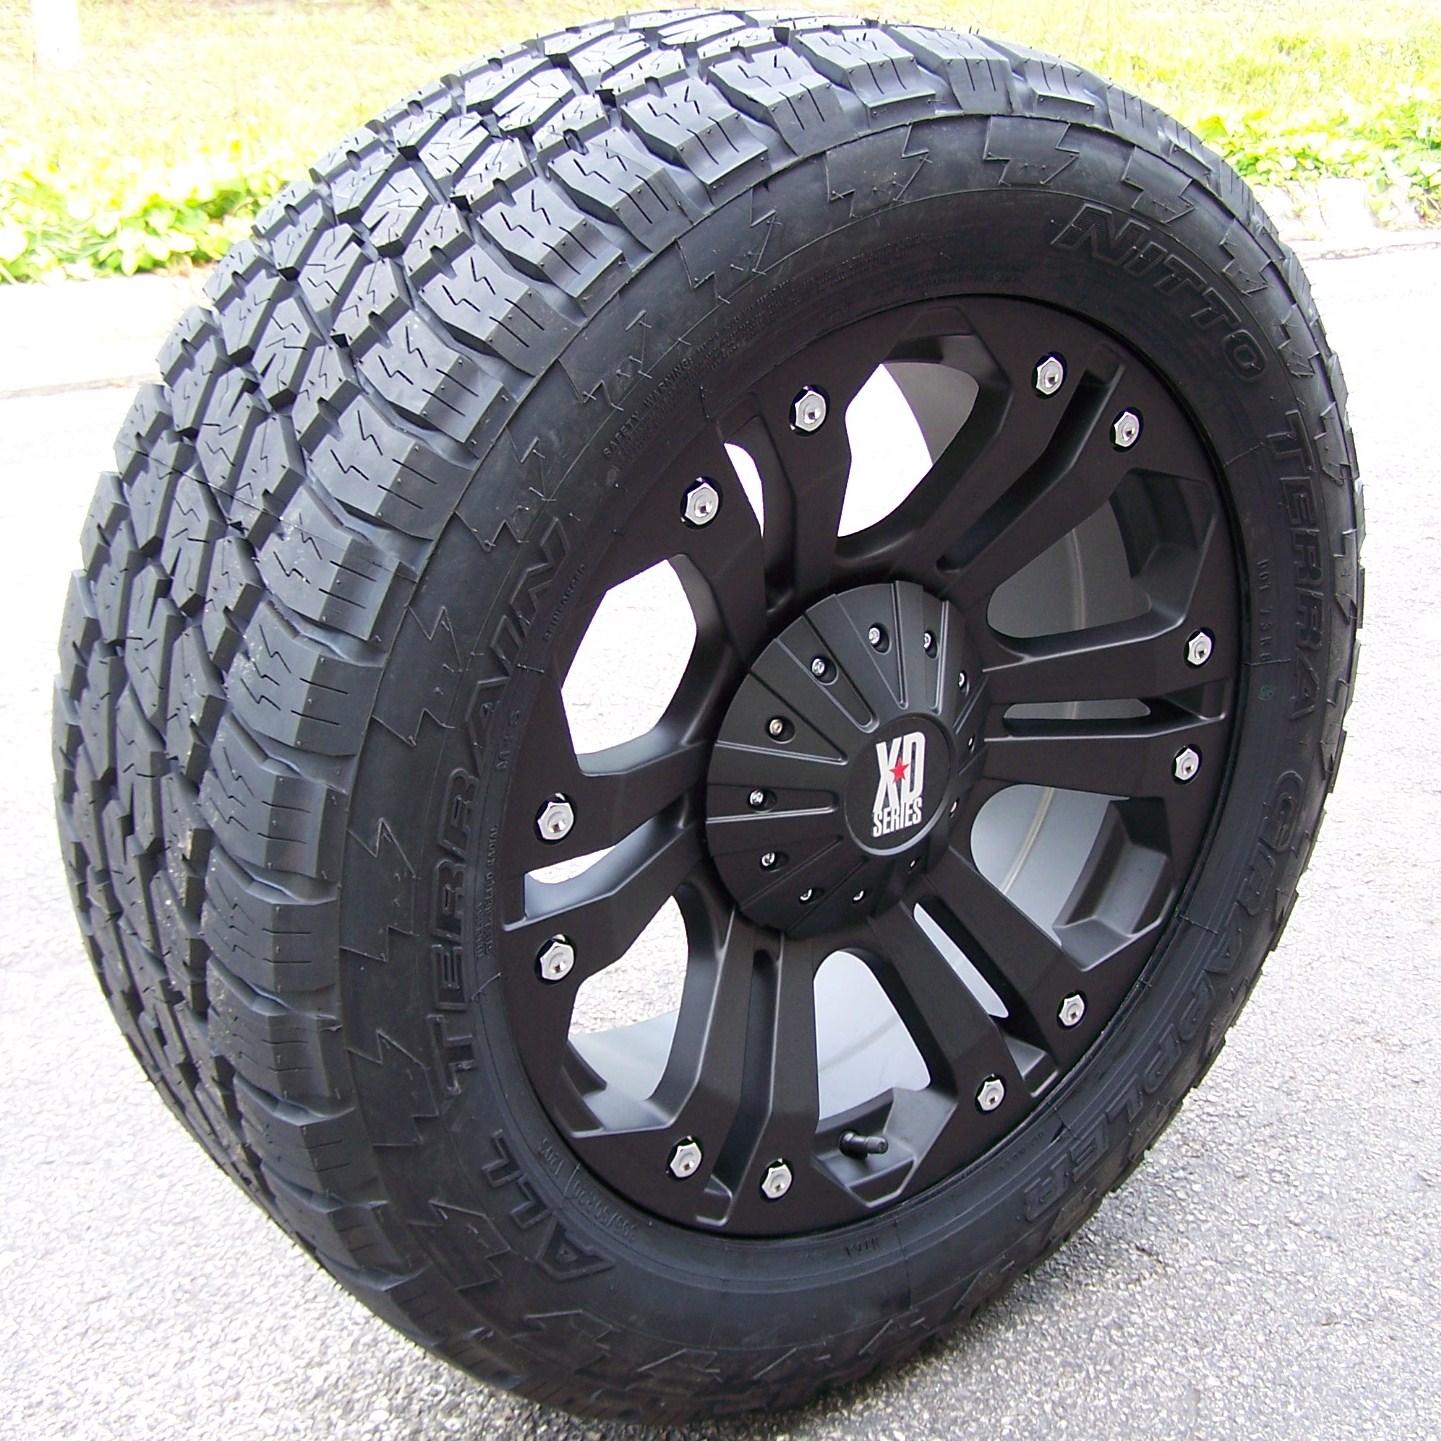 purchase  black monster wheels nitto terra grappler escalade suburban ford expedition